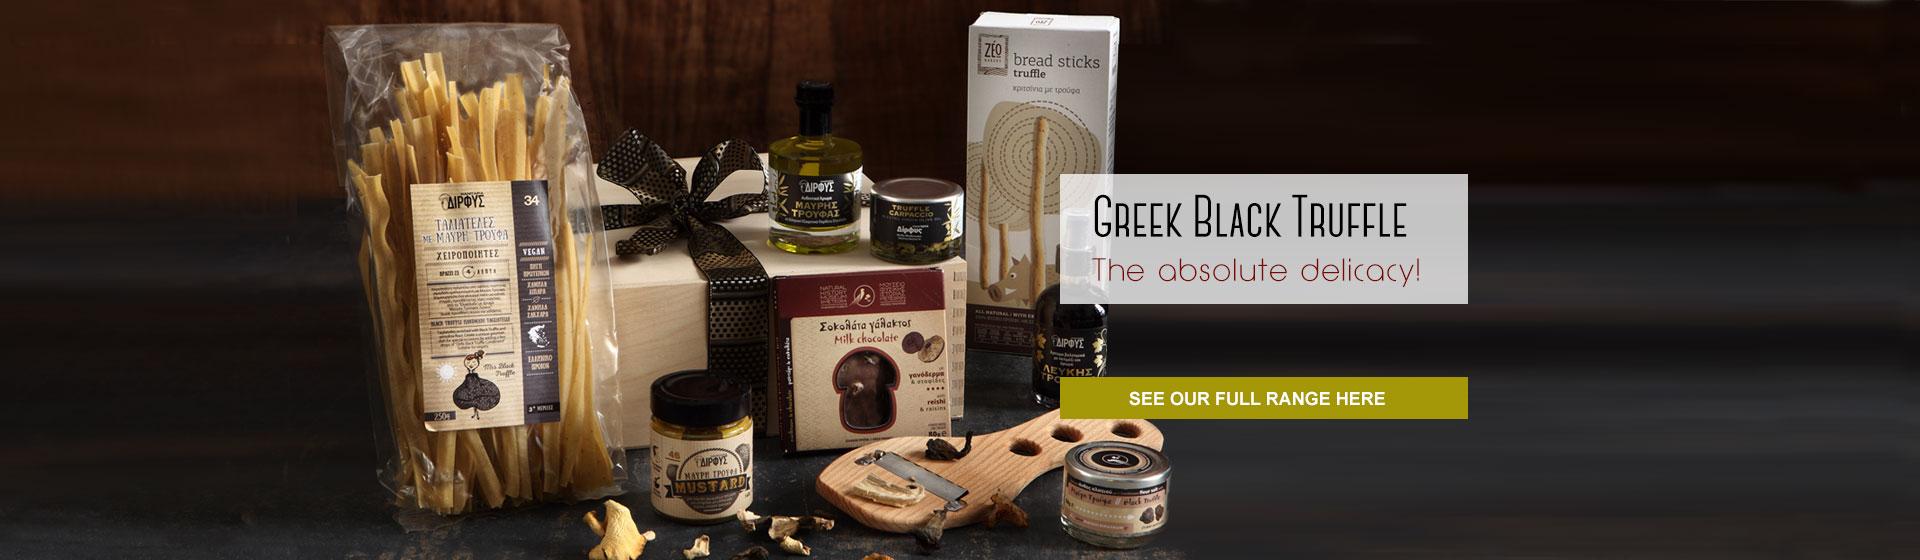 Greek Black Truffle